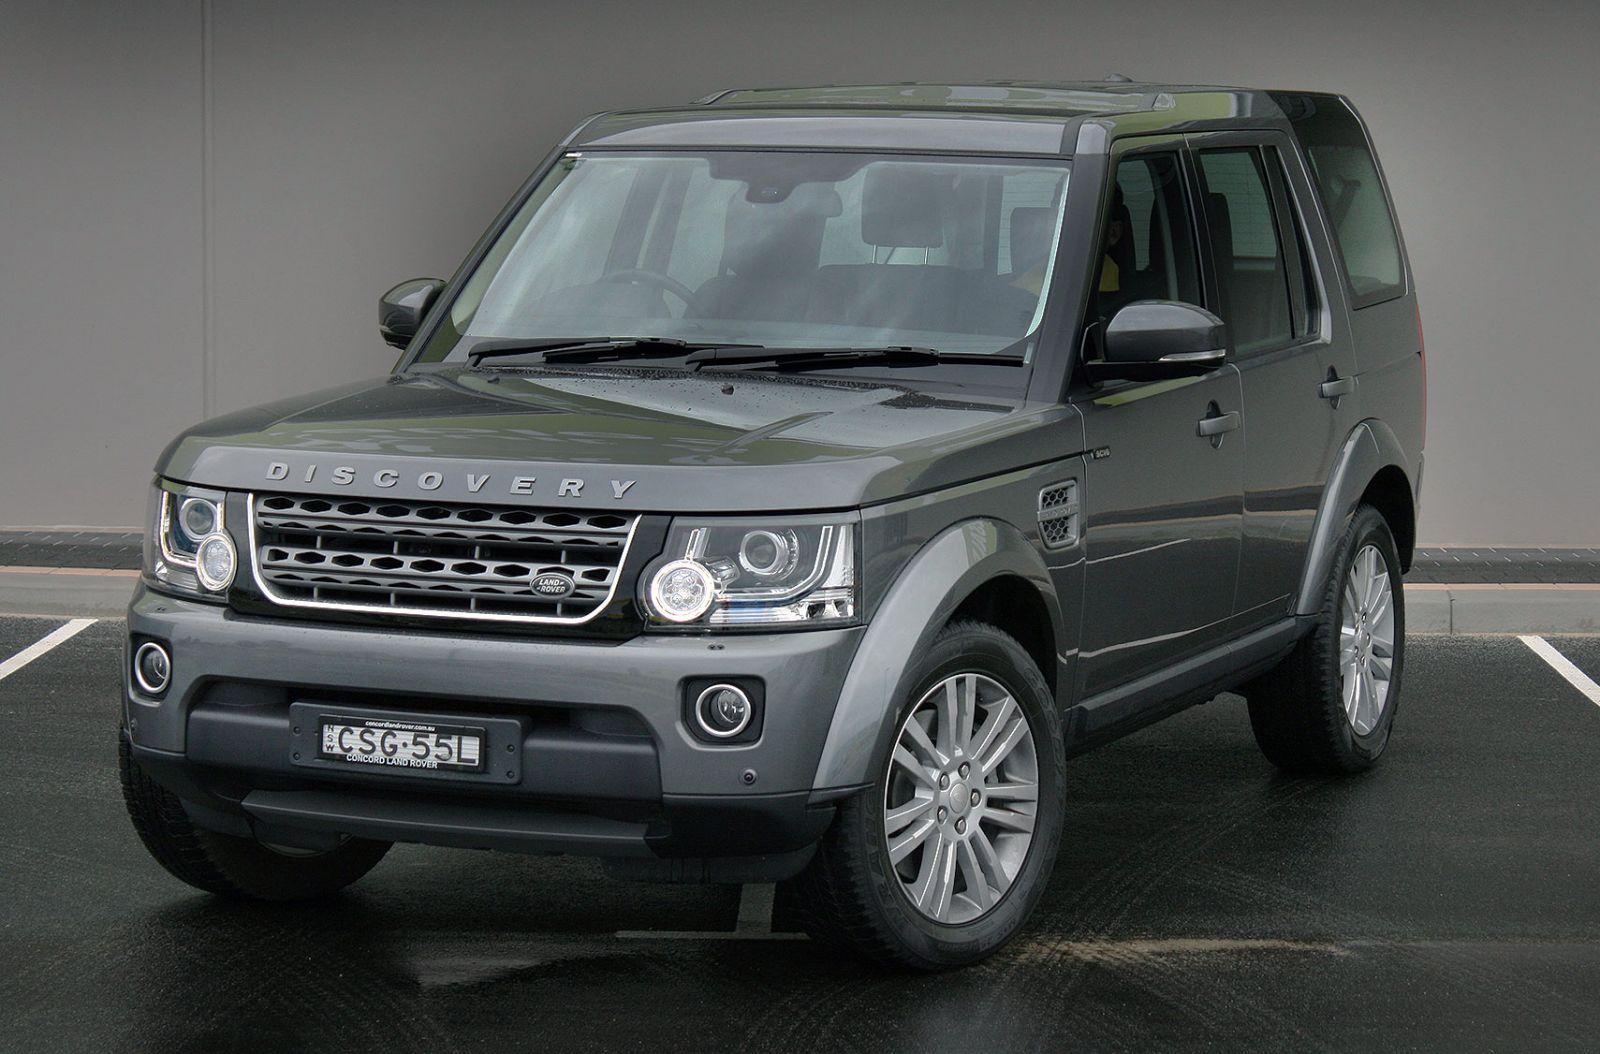 Recalls: Jaguar Land Rover 'Stalling Risk', Hyundai Tucson Bonnet Latches